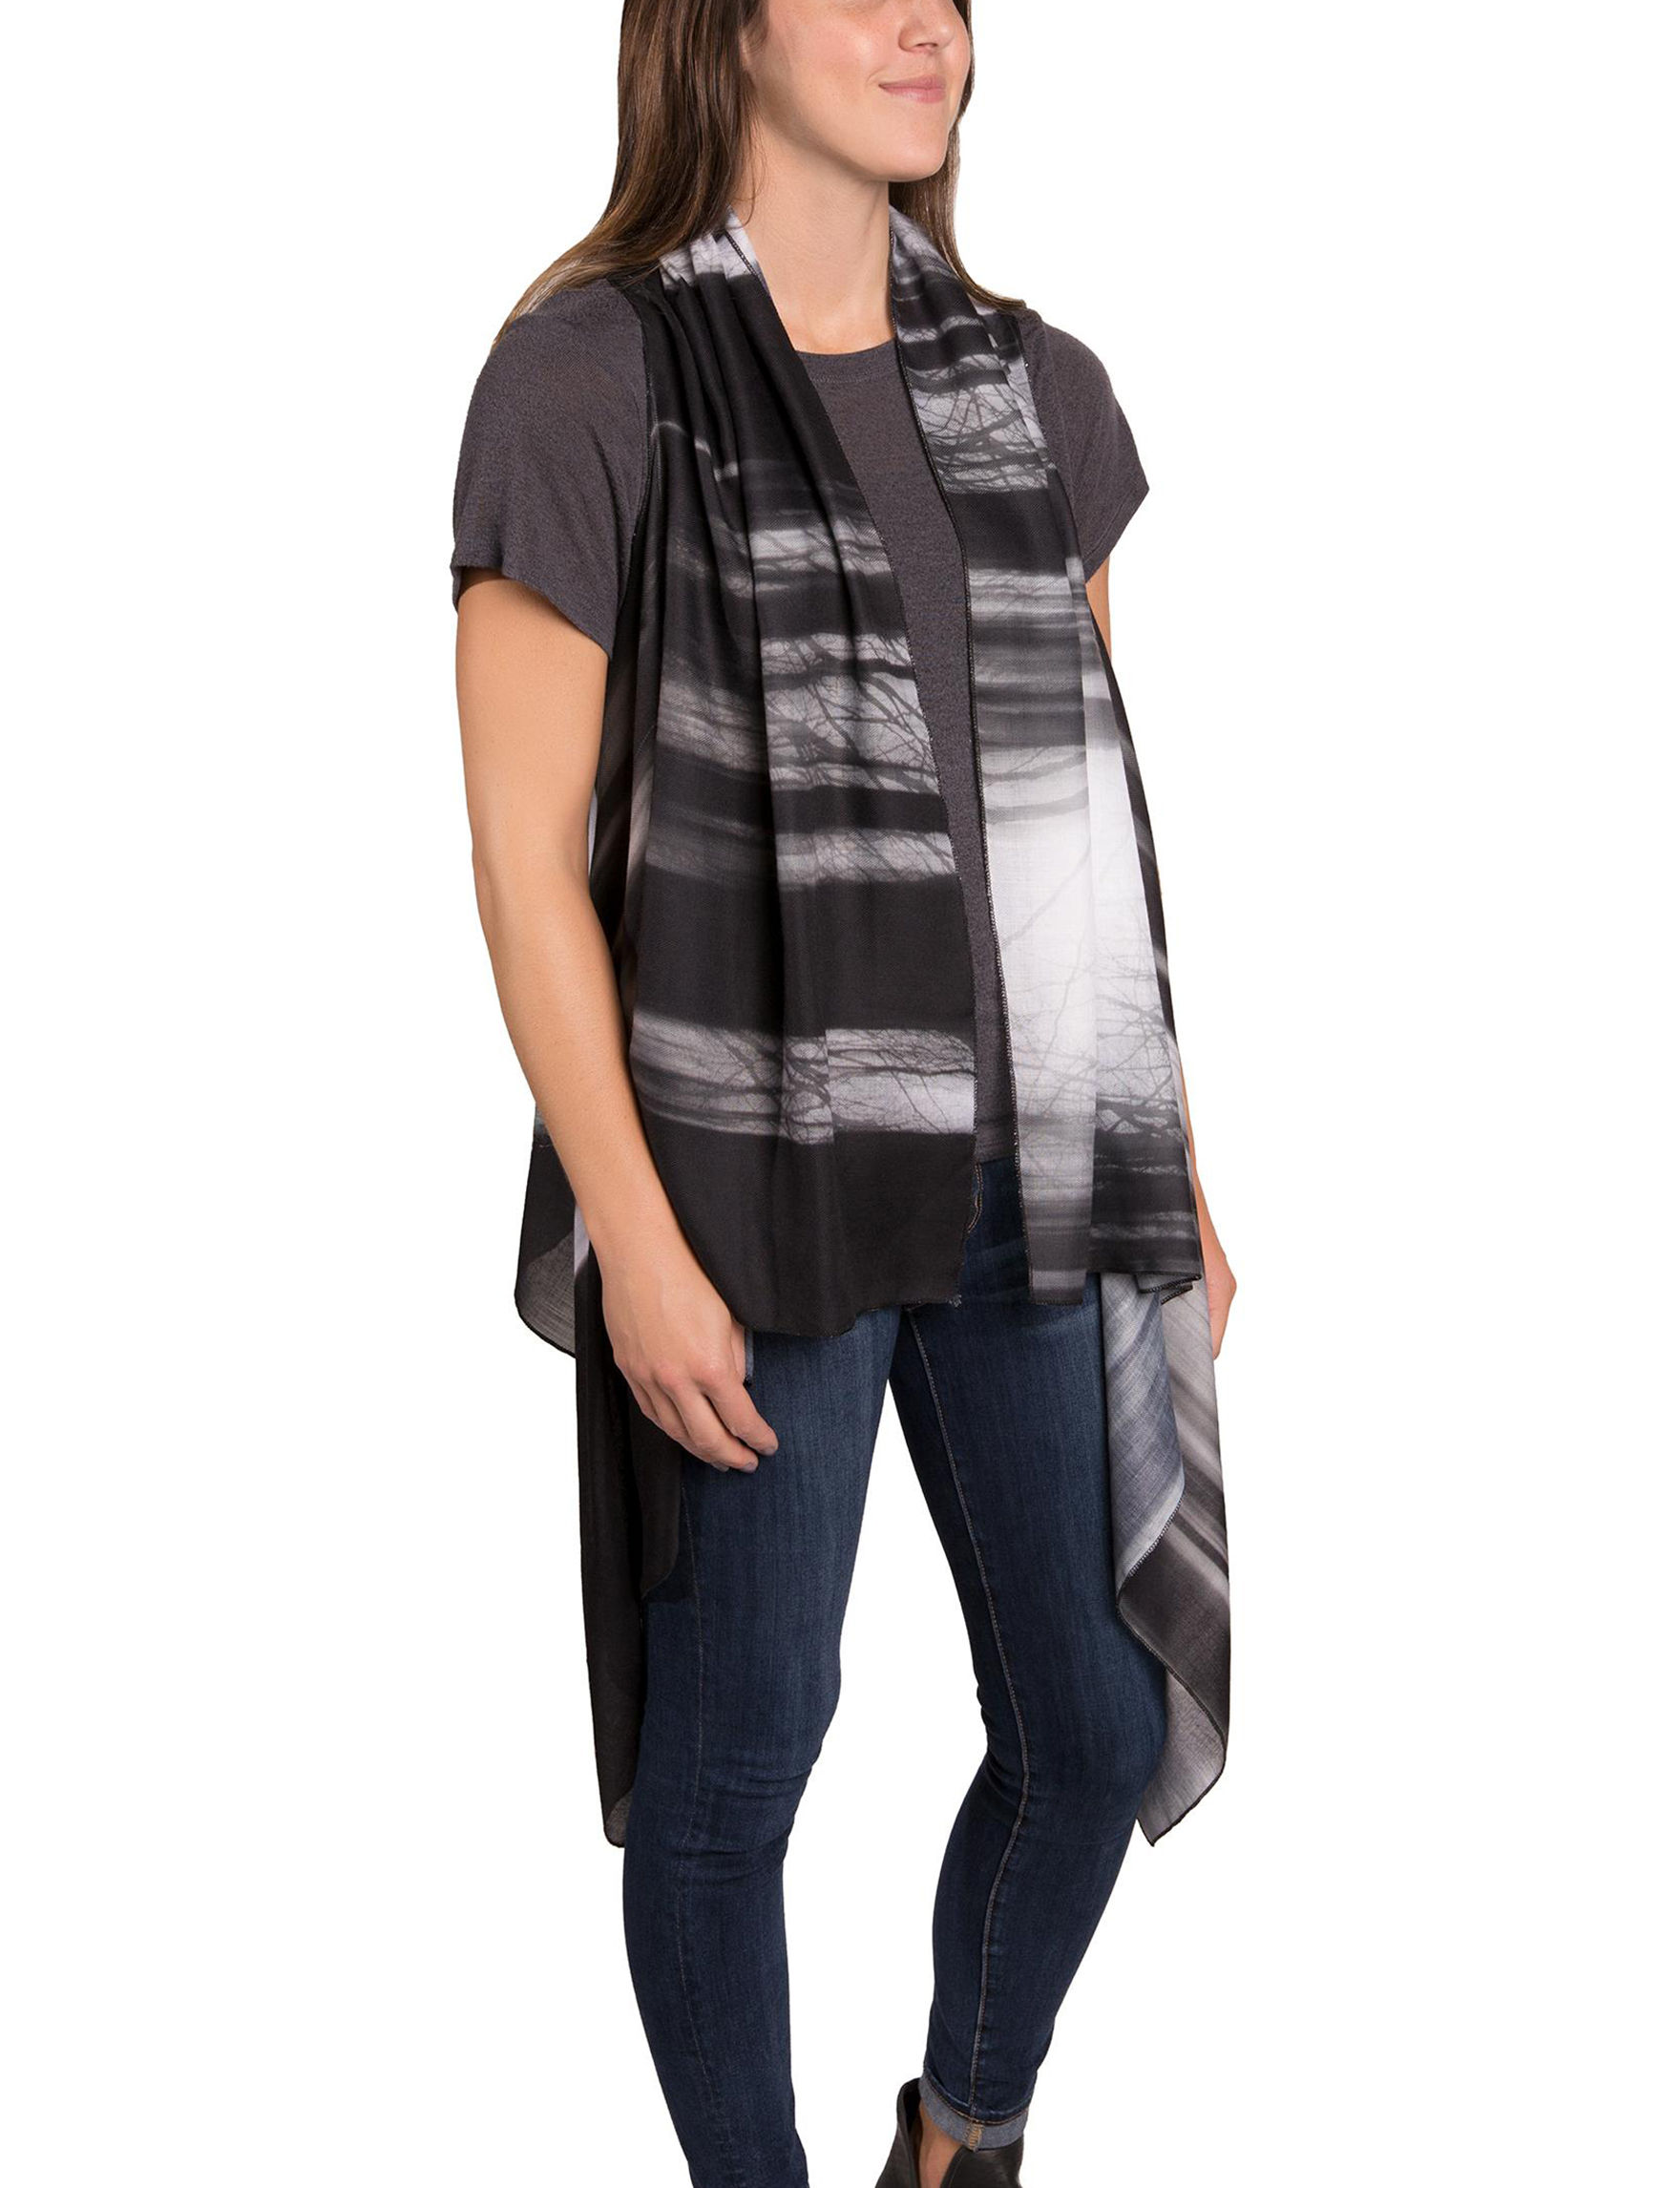 Demdaco Black Scarves & Wraps